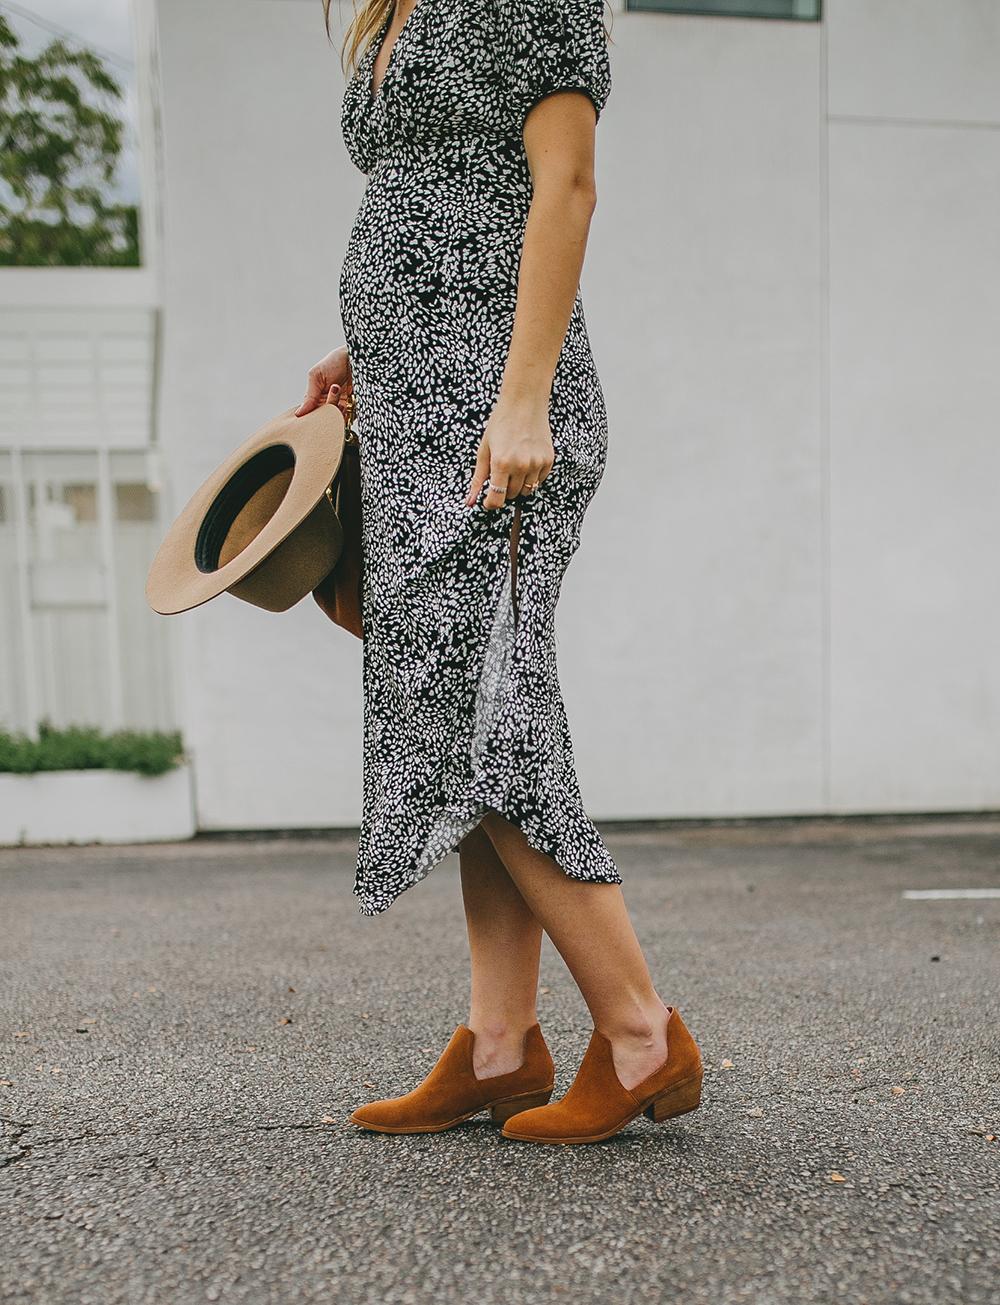 livvyland-blog-olivia-watson-free-peopl-looking-for-love-midi-dress-fedora-hat-outfit-chloe-medium-marcie-handbag-8